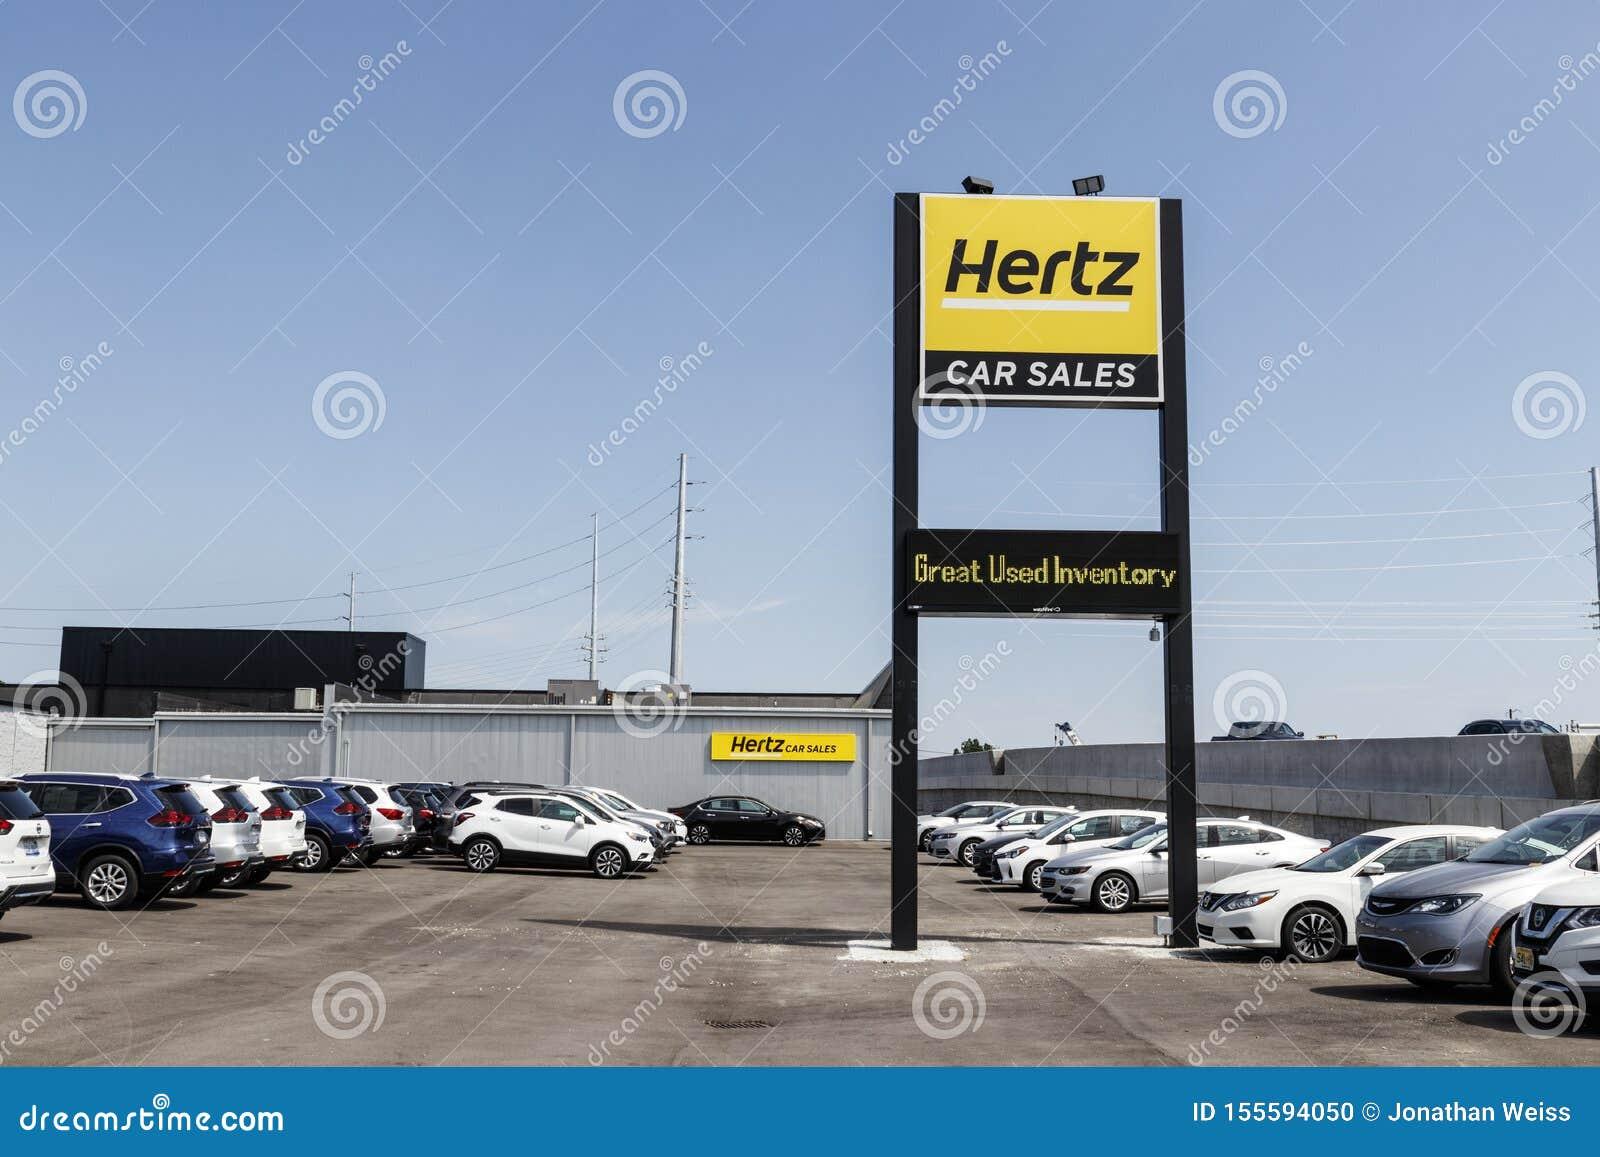 155 Hertz Car Rental Photos Free Royalty Free Stock Photos From Dreamstime